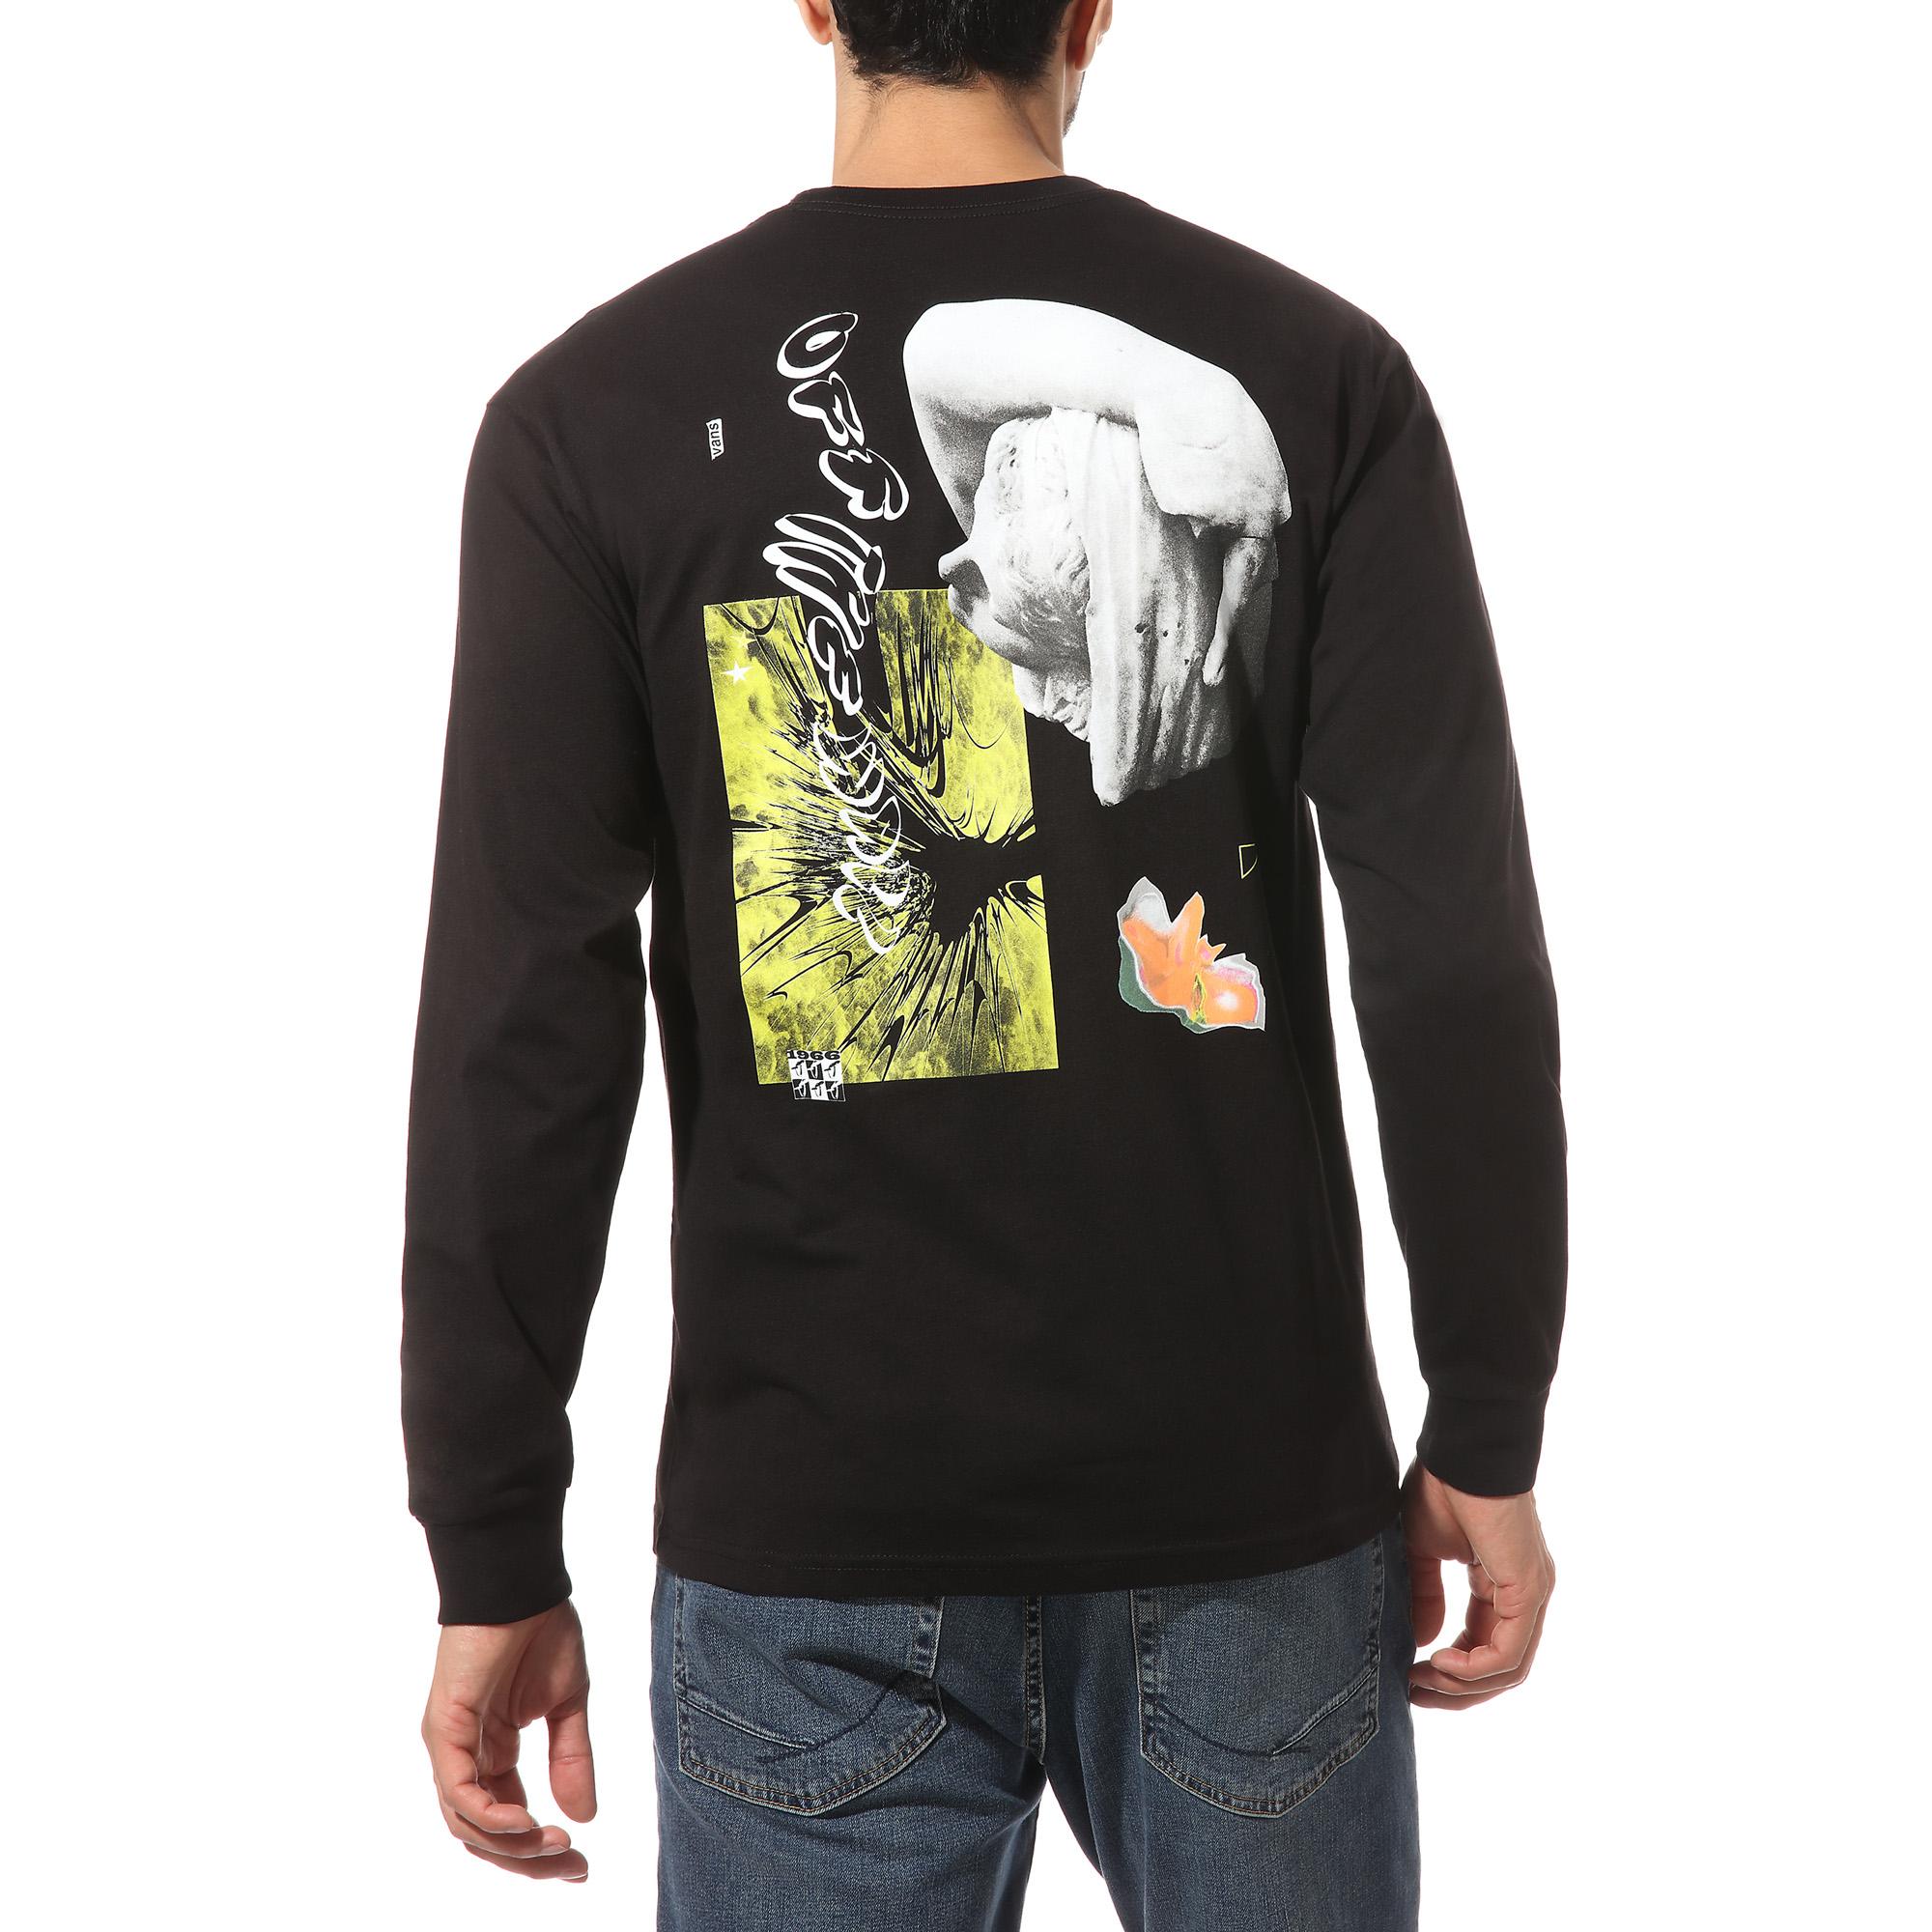 Vans Warped Collage long sleeve t-shirt, black, medium